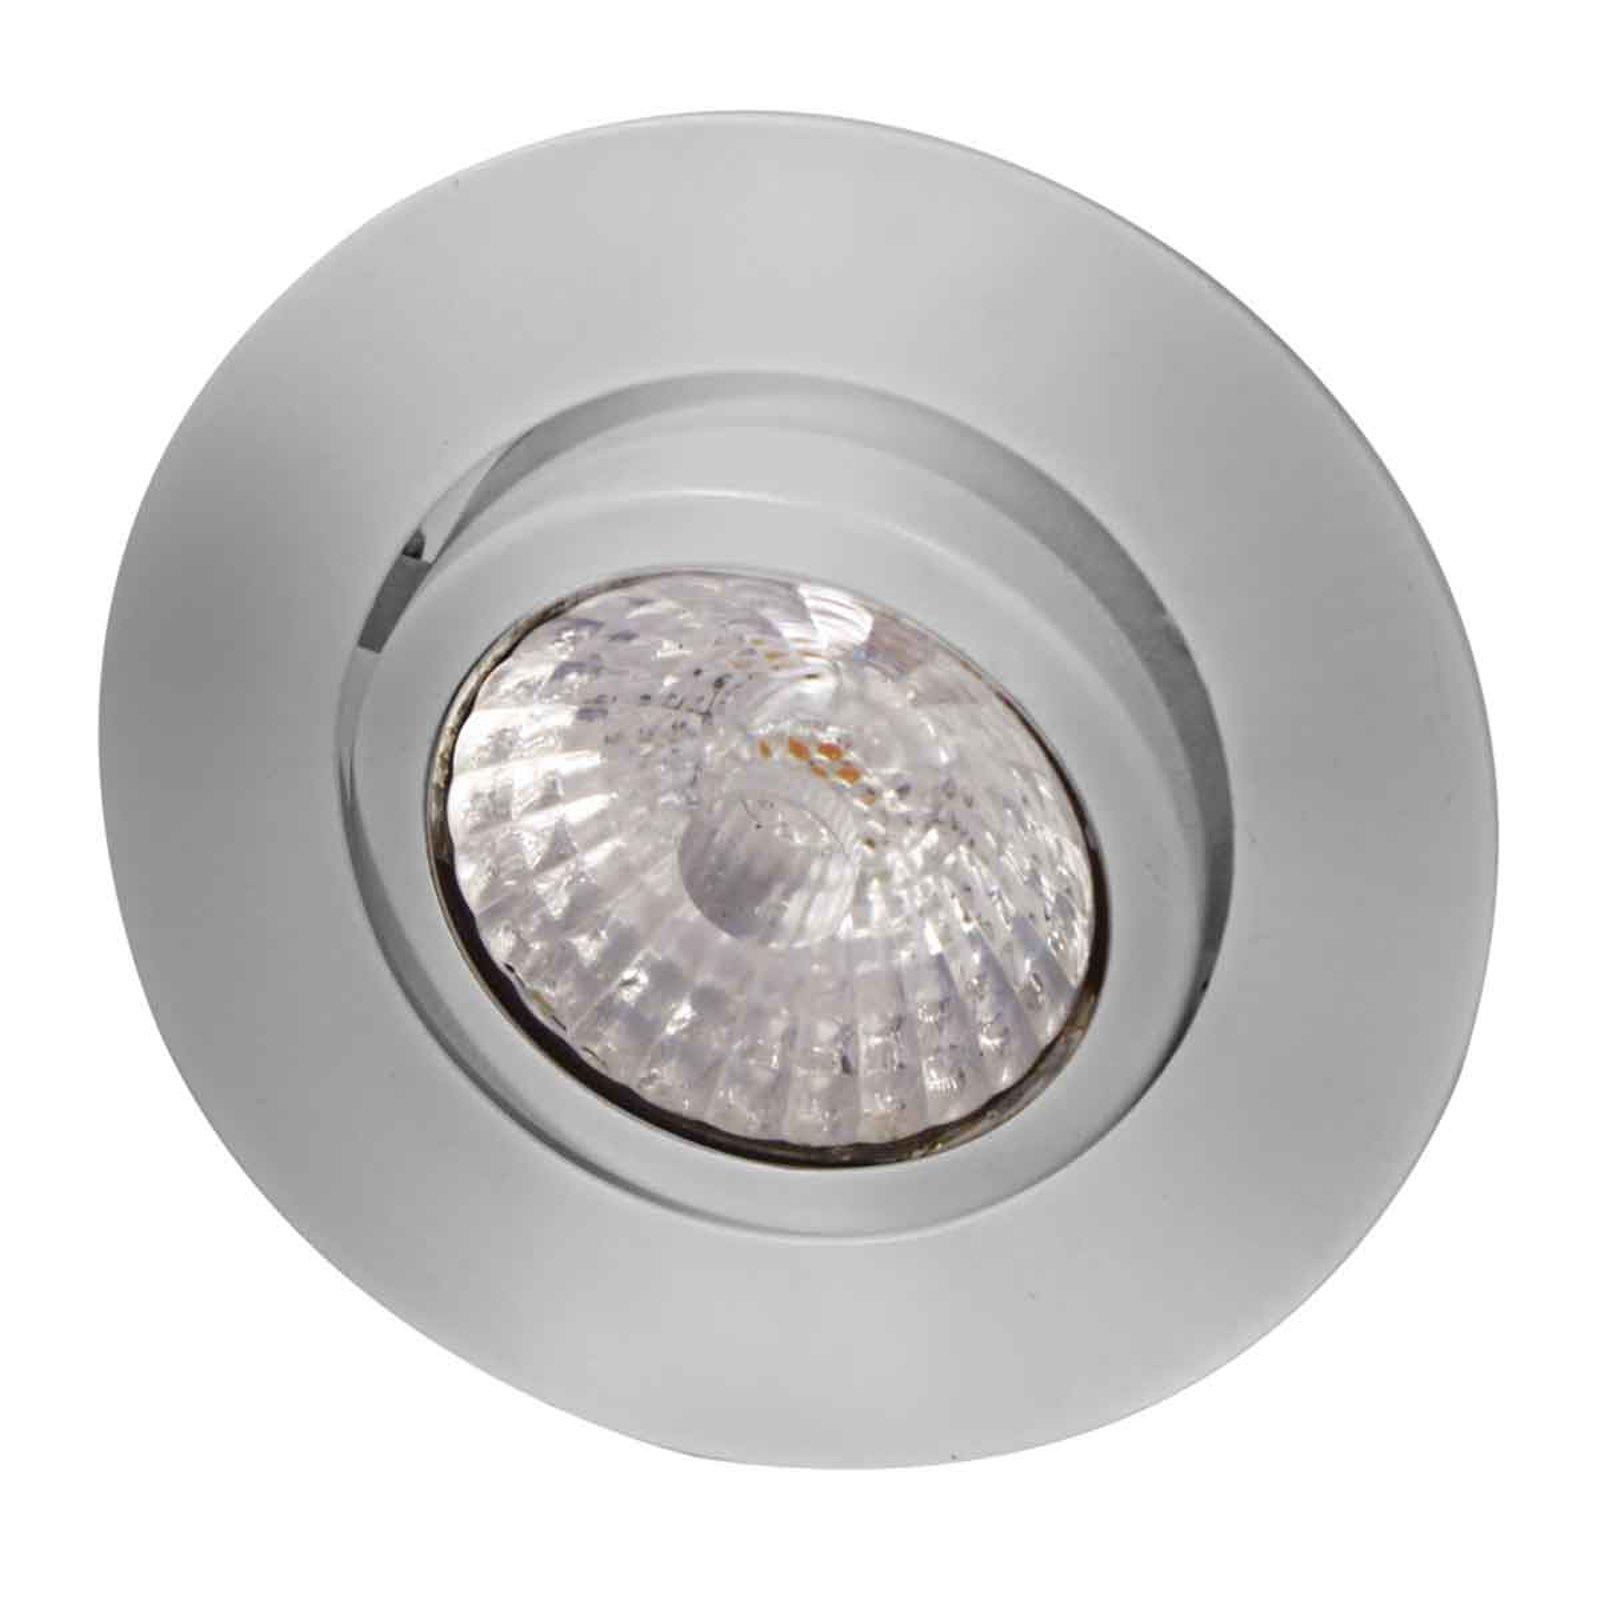 Rico LED innfellingspot, dim to warm, børstet stål